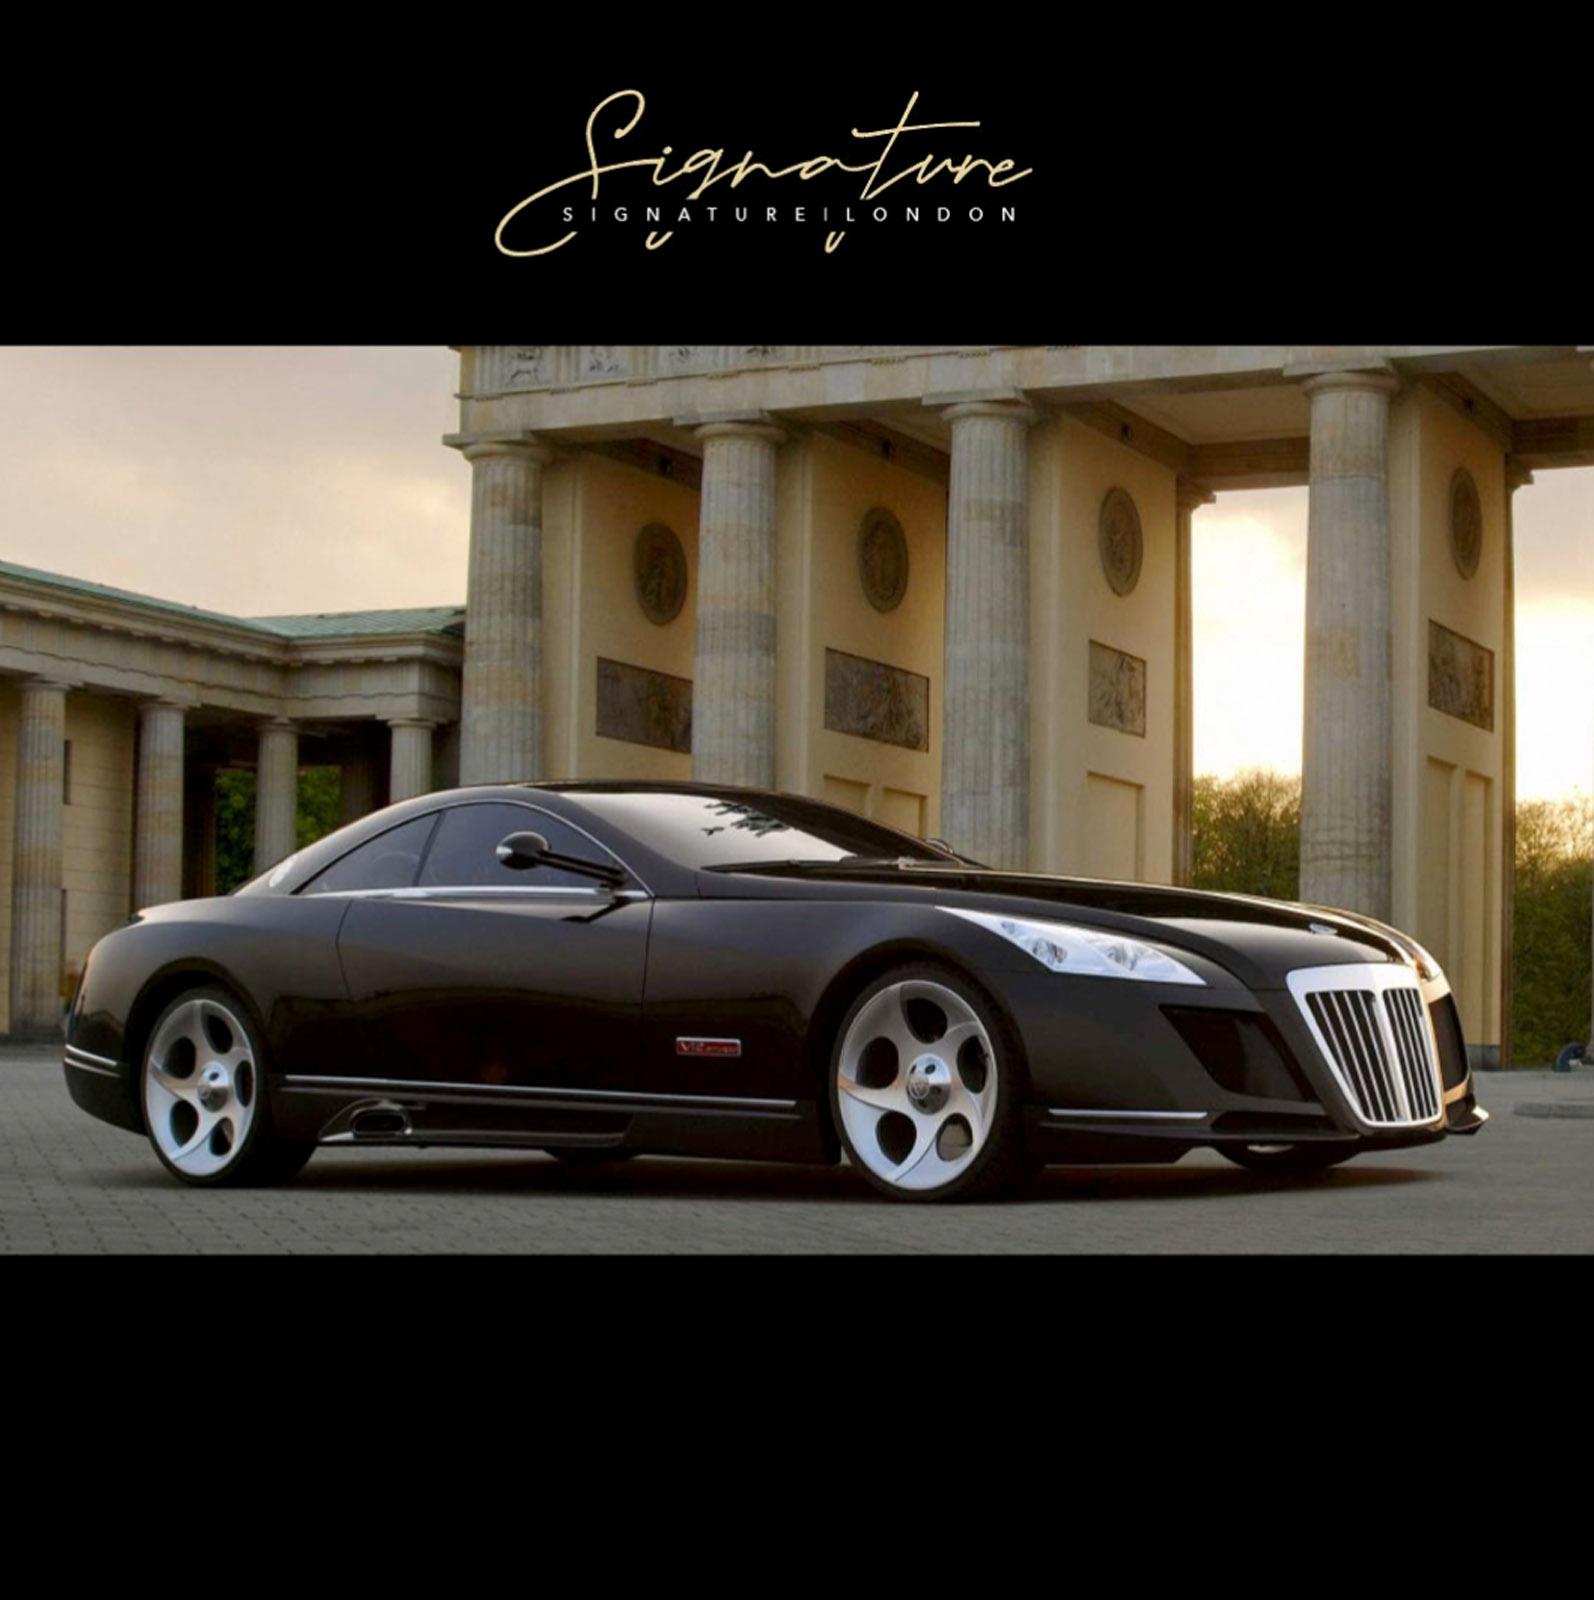 luxury-brand-identity-design-london06